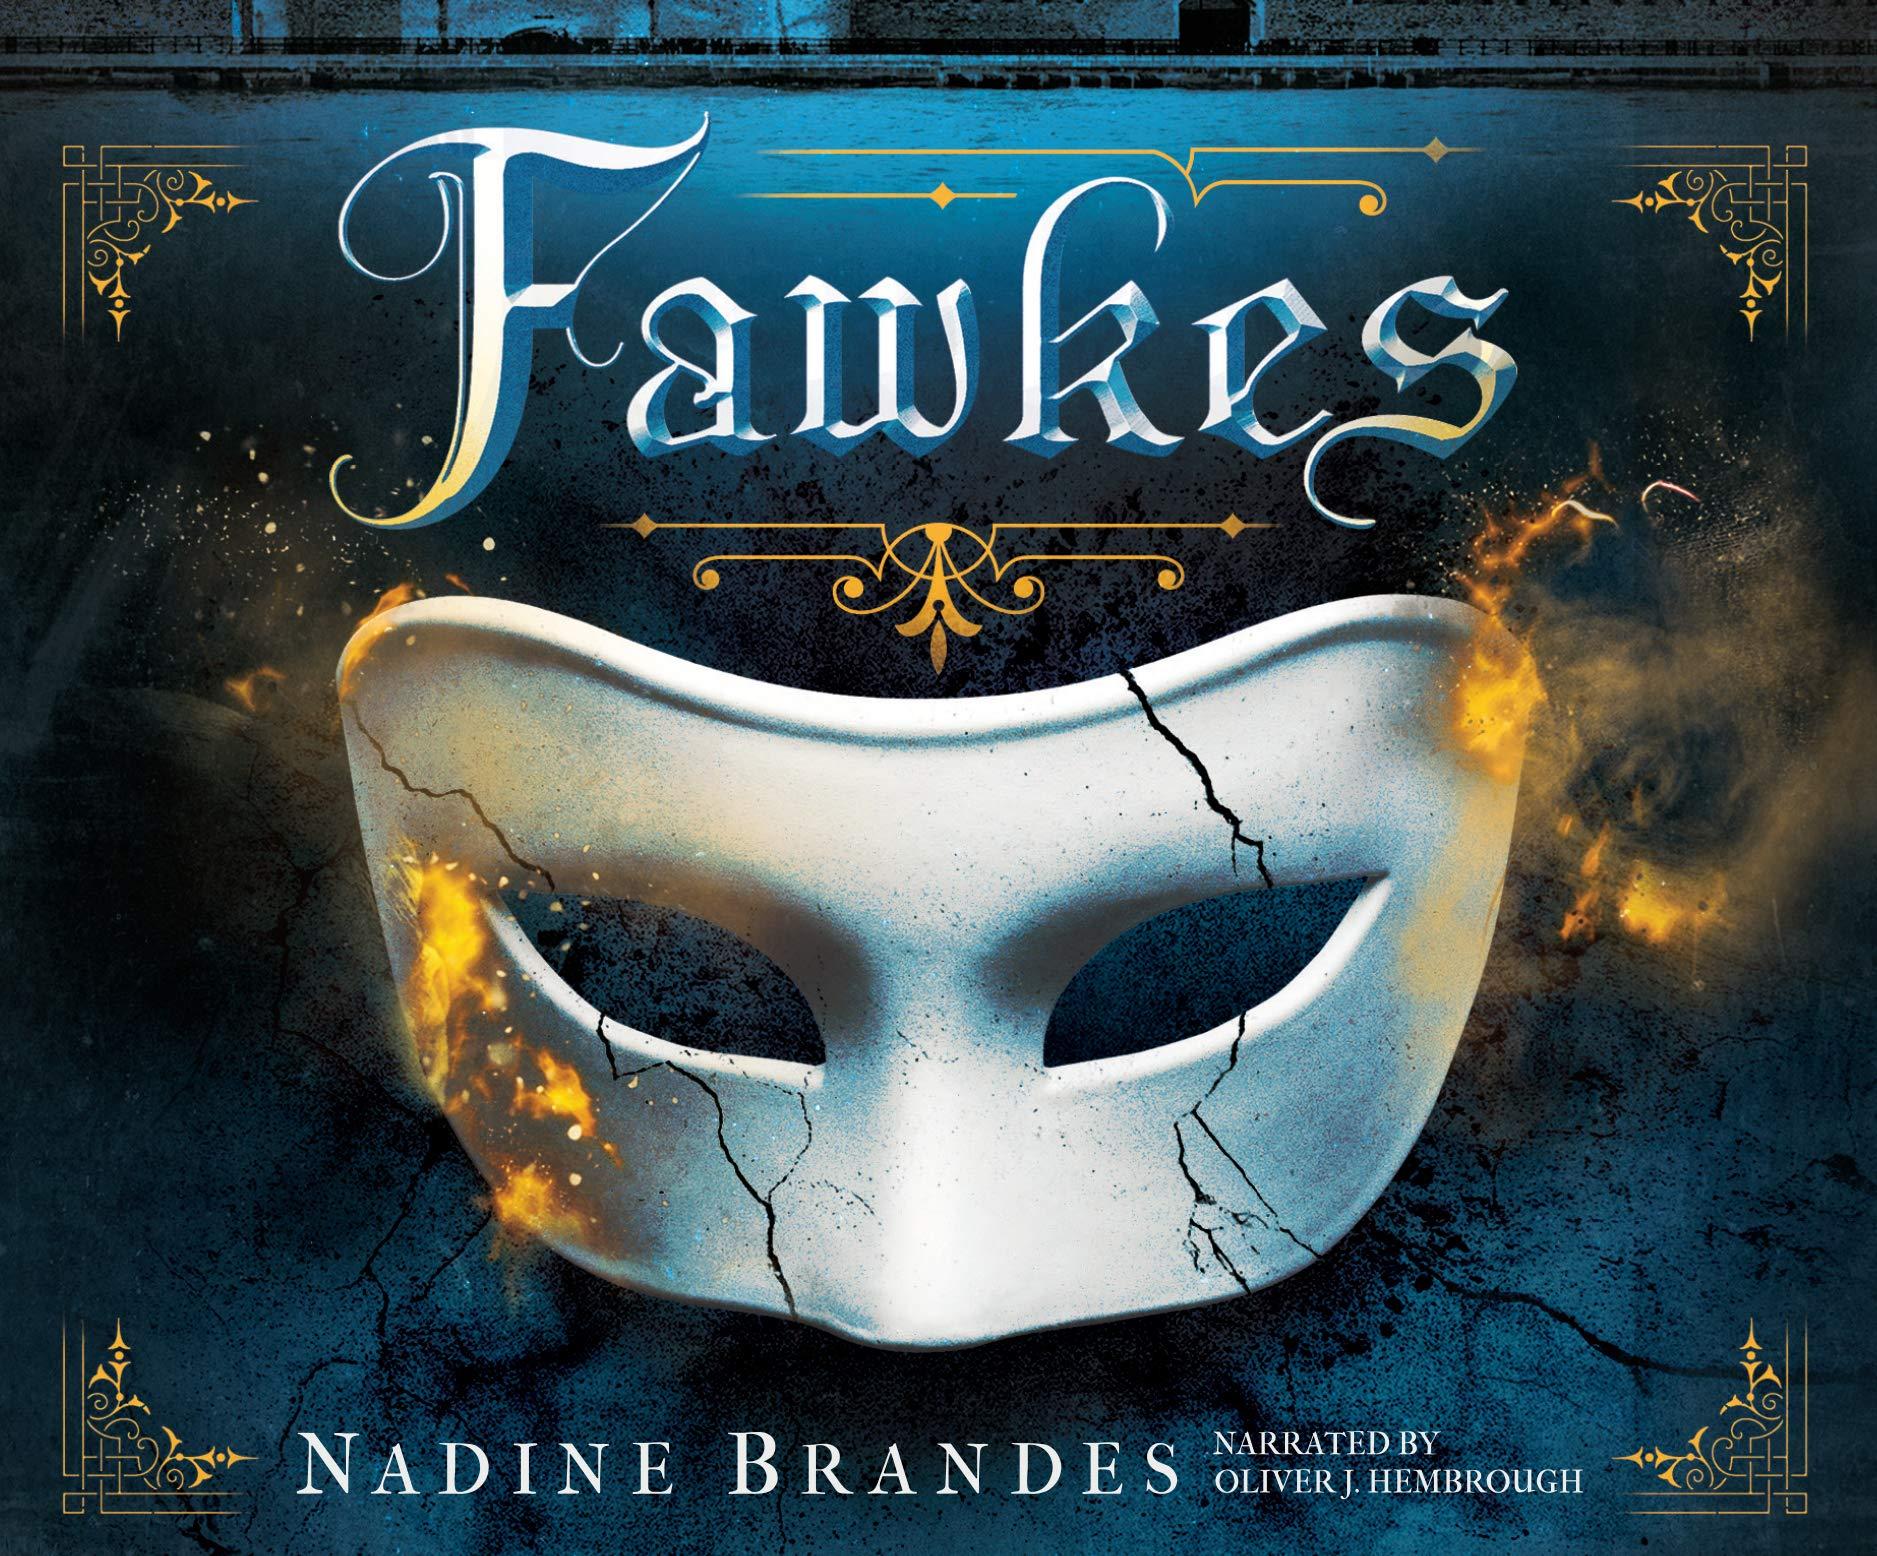 Amazon.com: Fawkes: A Novel (9781974906291): Nadine Brandes, Oliver ...